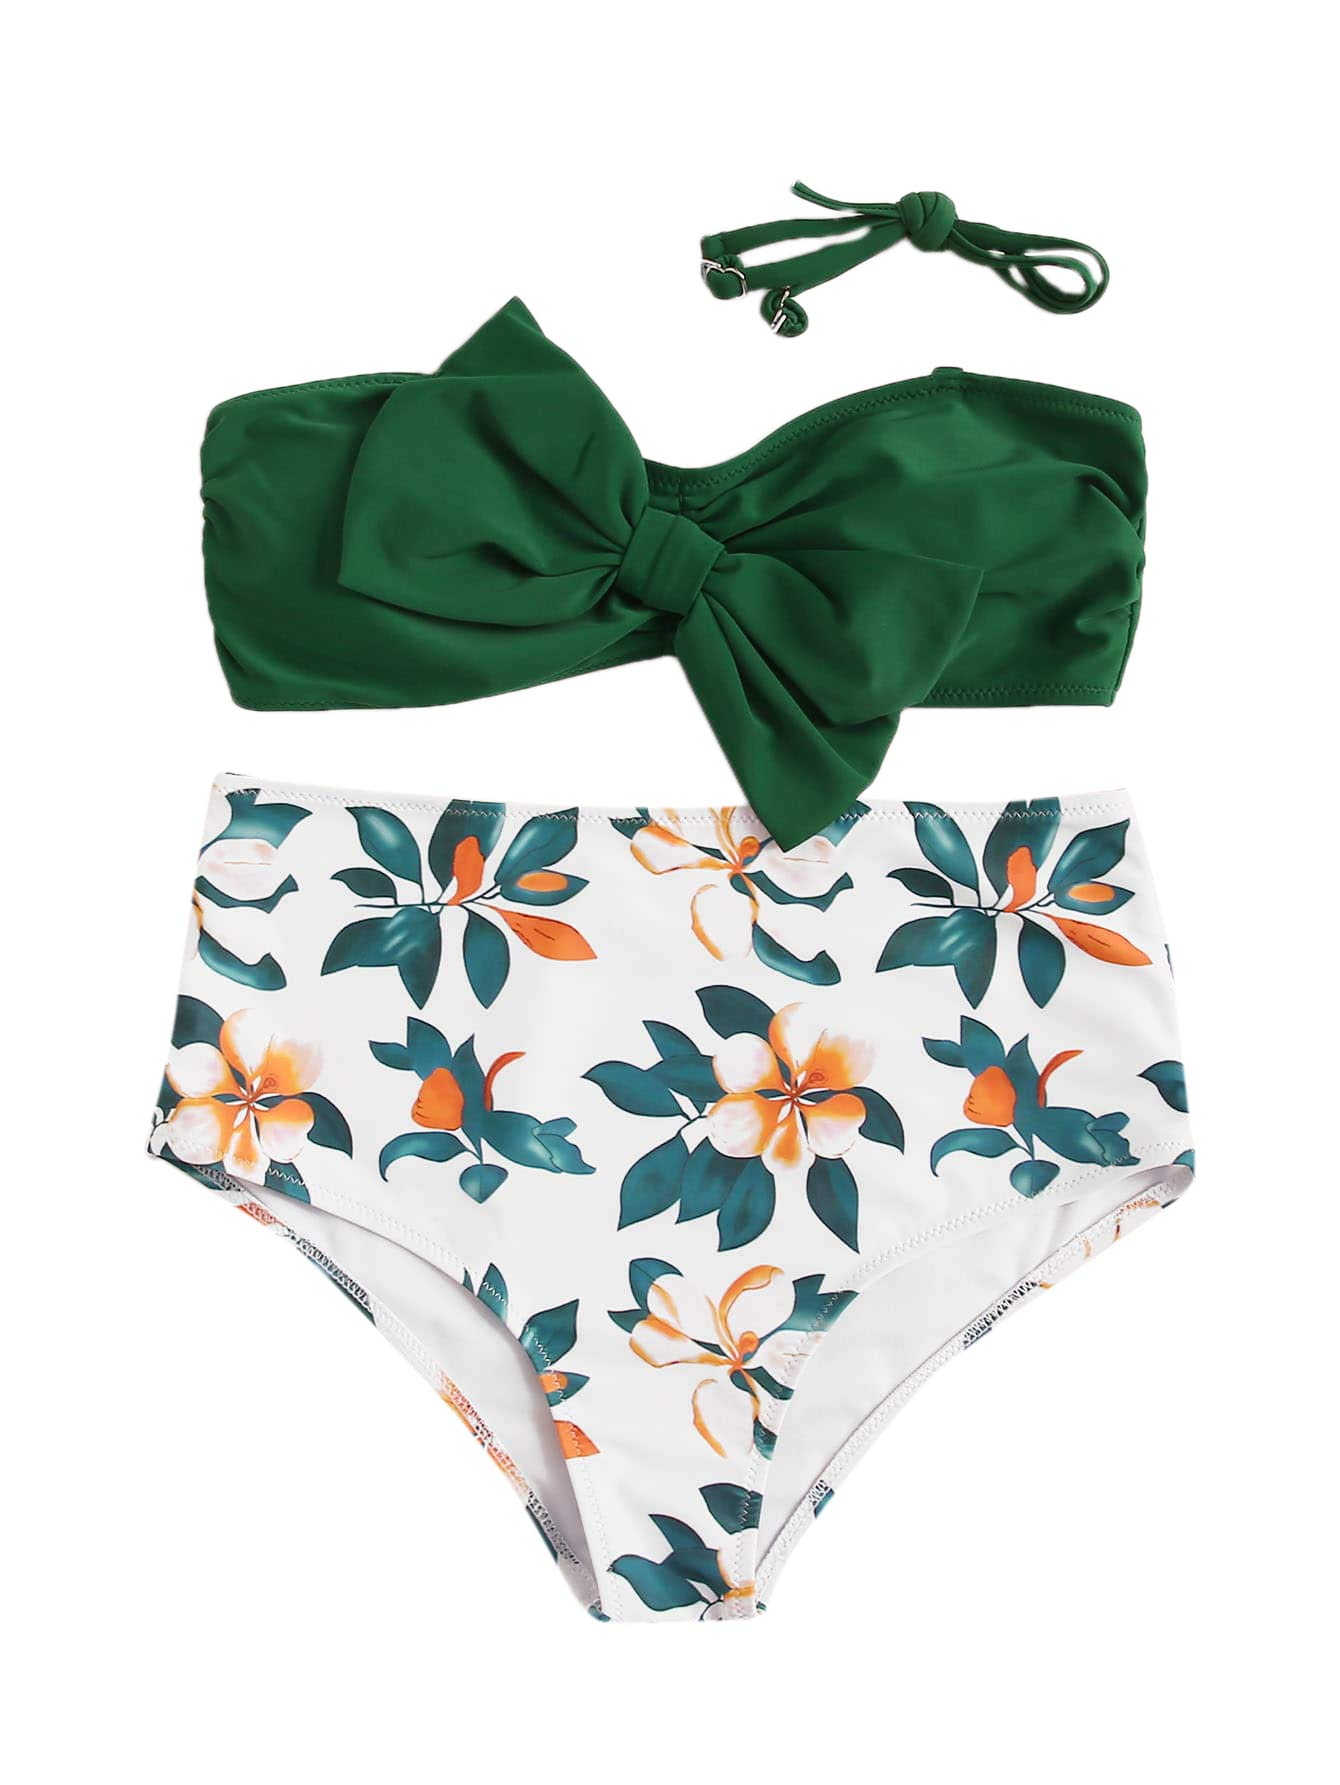 SweatyRocks Women's Swimwear Set Bow Bikini Top Floral High Waisted Swimsuits